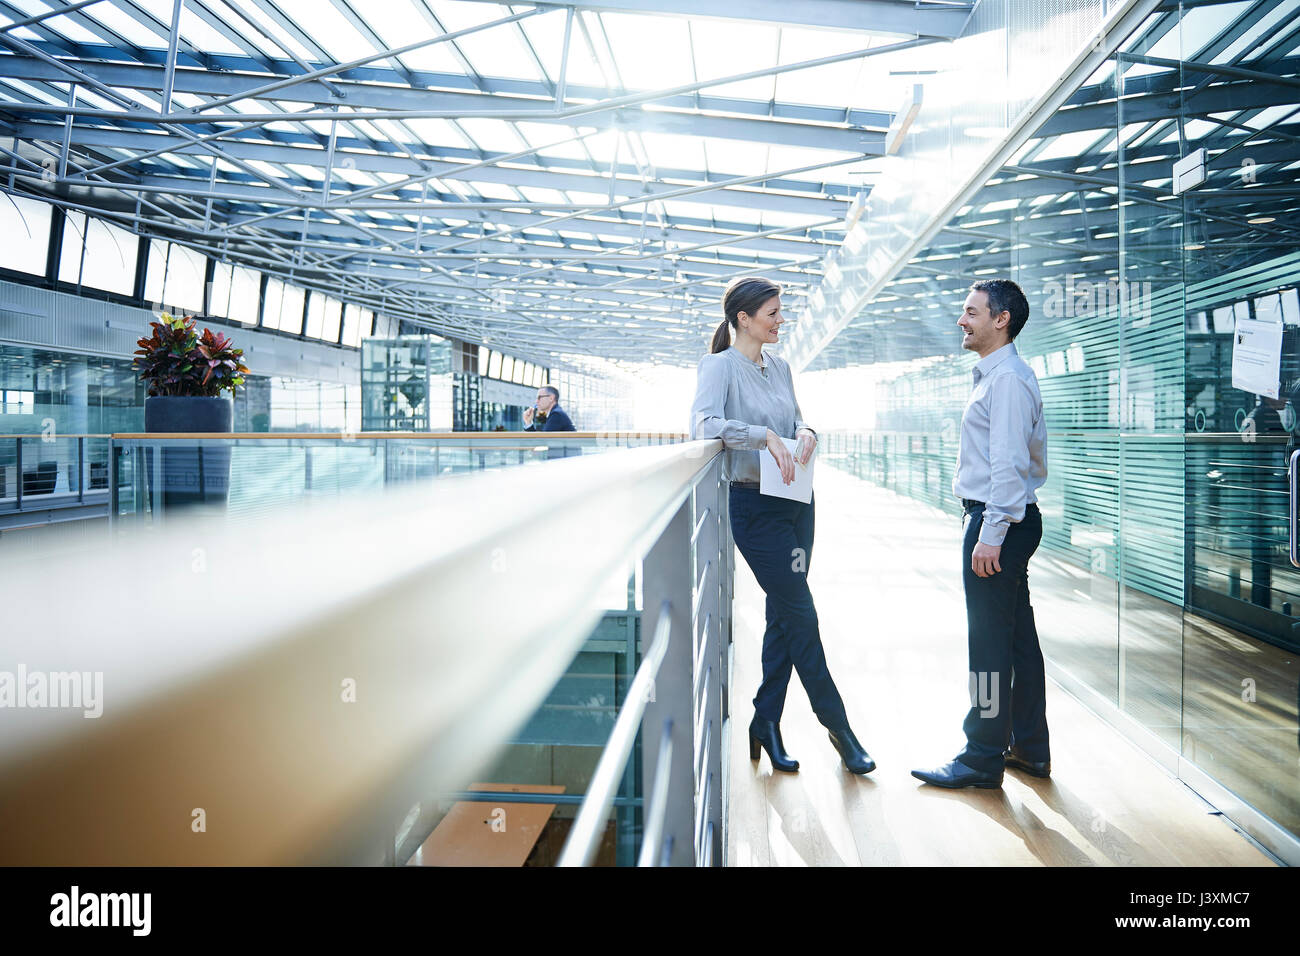 Geschäftsmann und Frau am Büro Balkon Stockbild